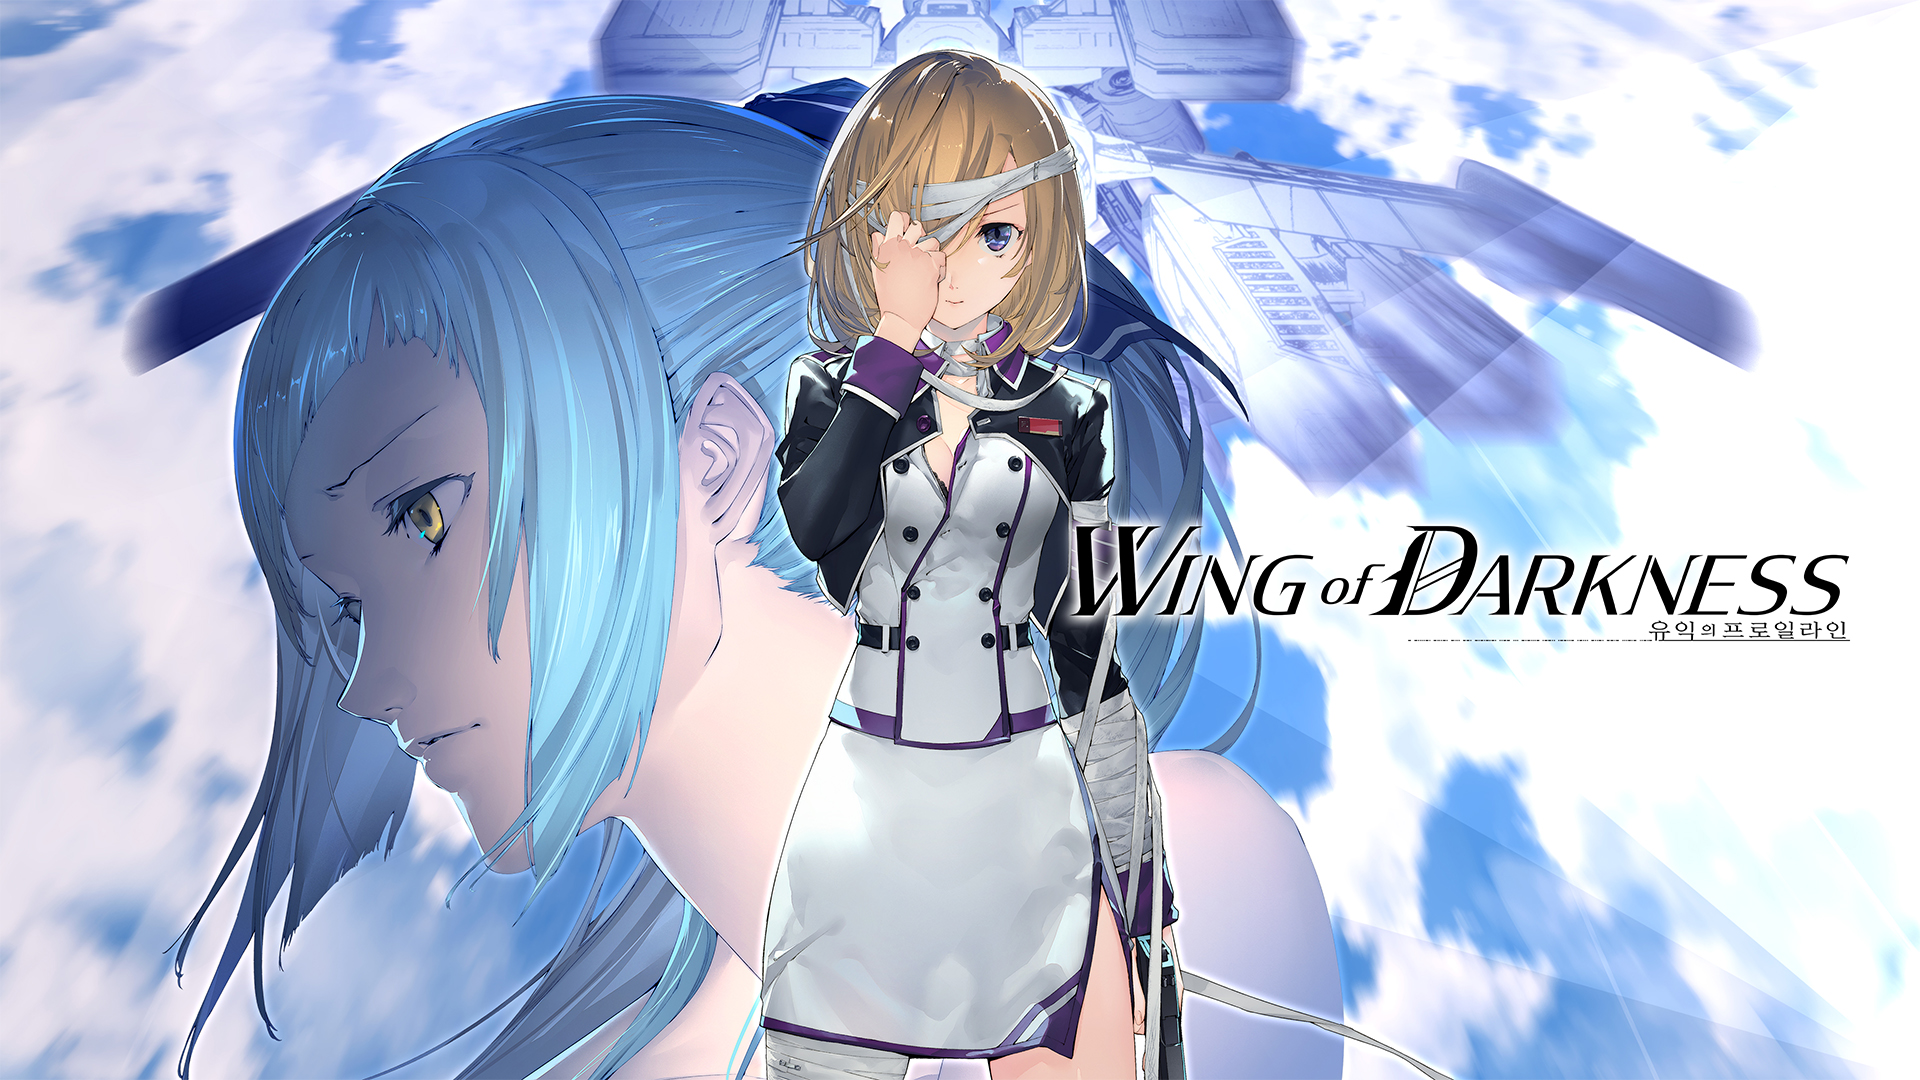 Wing of Darkness 유익의 프로일라인